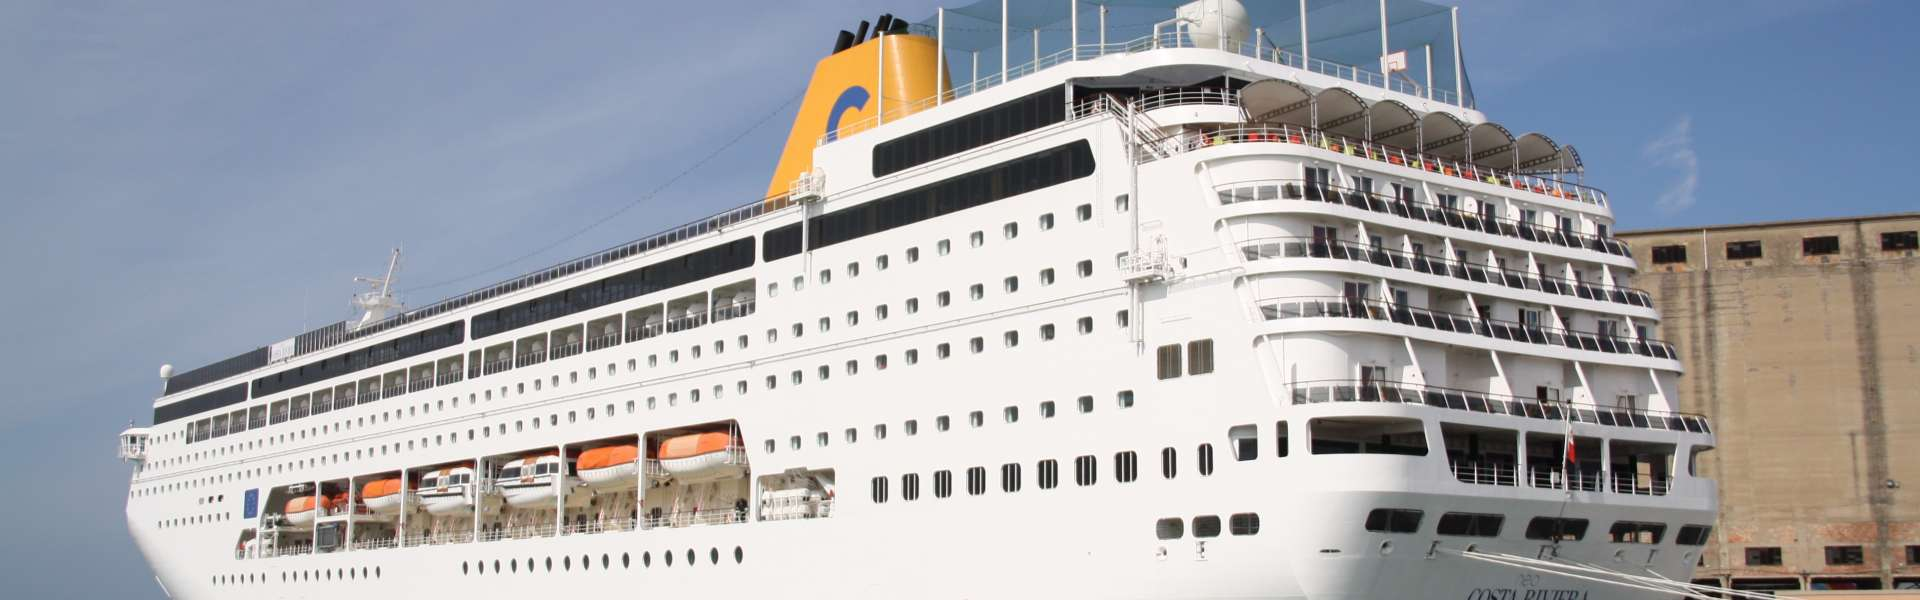 Croaziera 2019 - Asia/Africa si Orientul Mijlociu (Male) - Costa Cruises - Costa NeoRiviera - 7 nopti